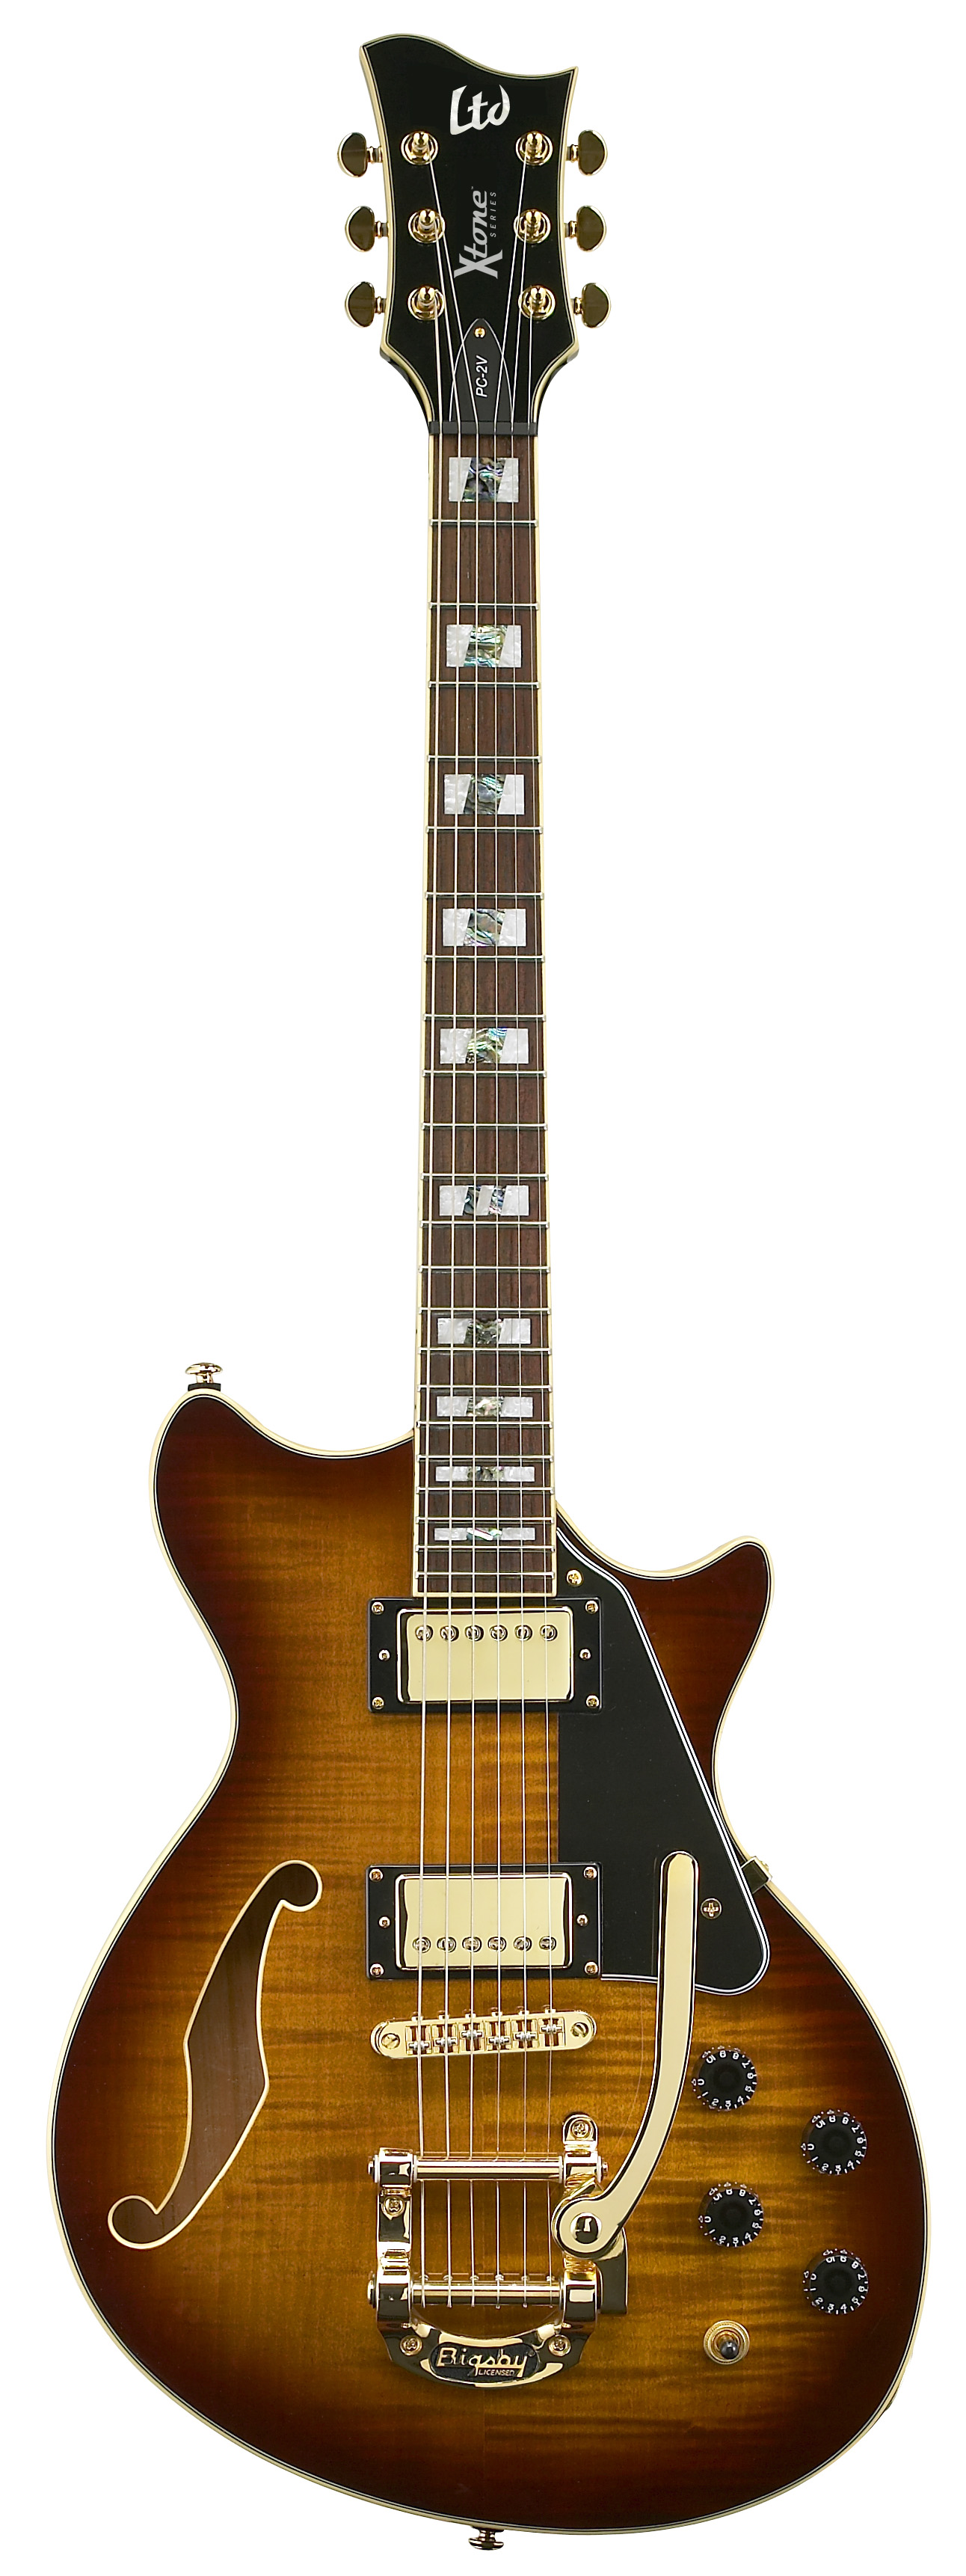 esp ltd pc 2v x tone paramount hollow body electric guitar brown sunburst finish xpc2vbsb. Black Bedroom Furniture Sets. Home Design Ideas